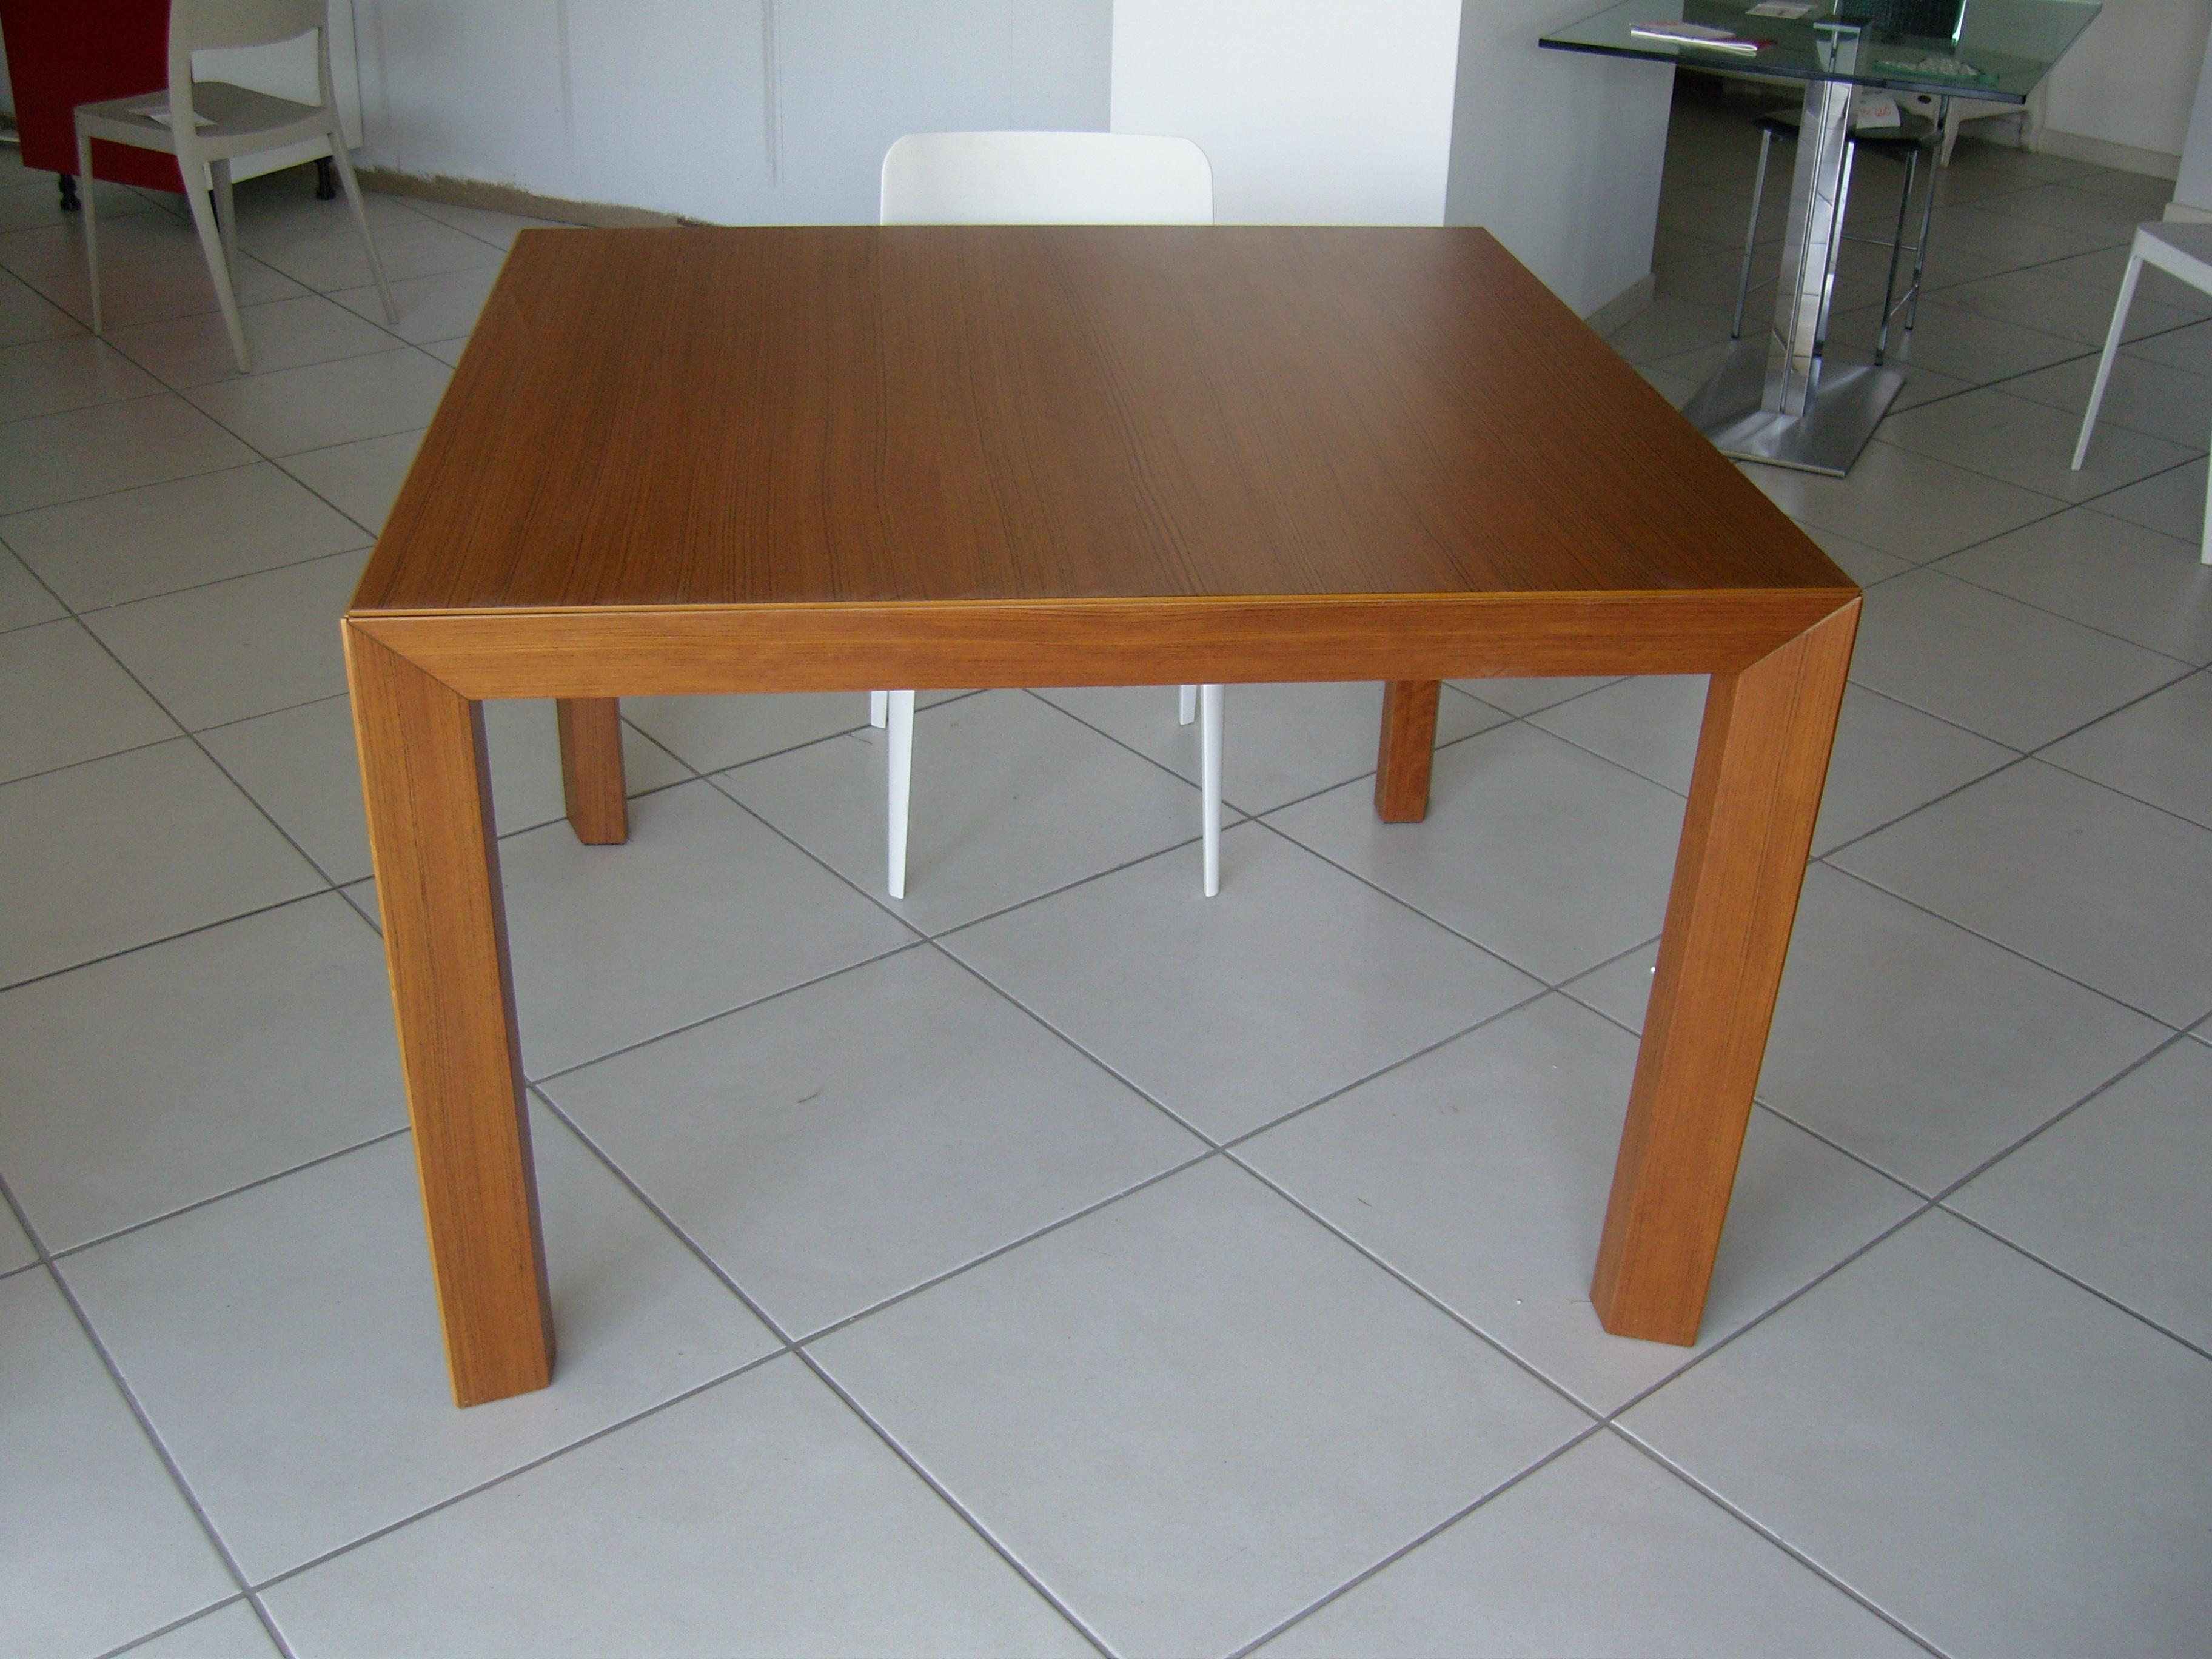 Emejing tavolo allungabile quadrato photos for Tavoli allungabili quadrati